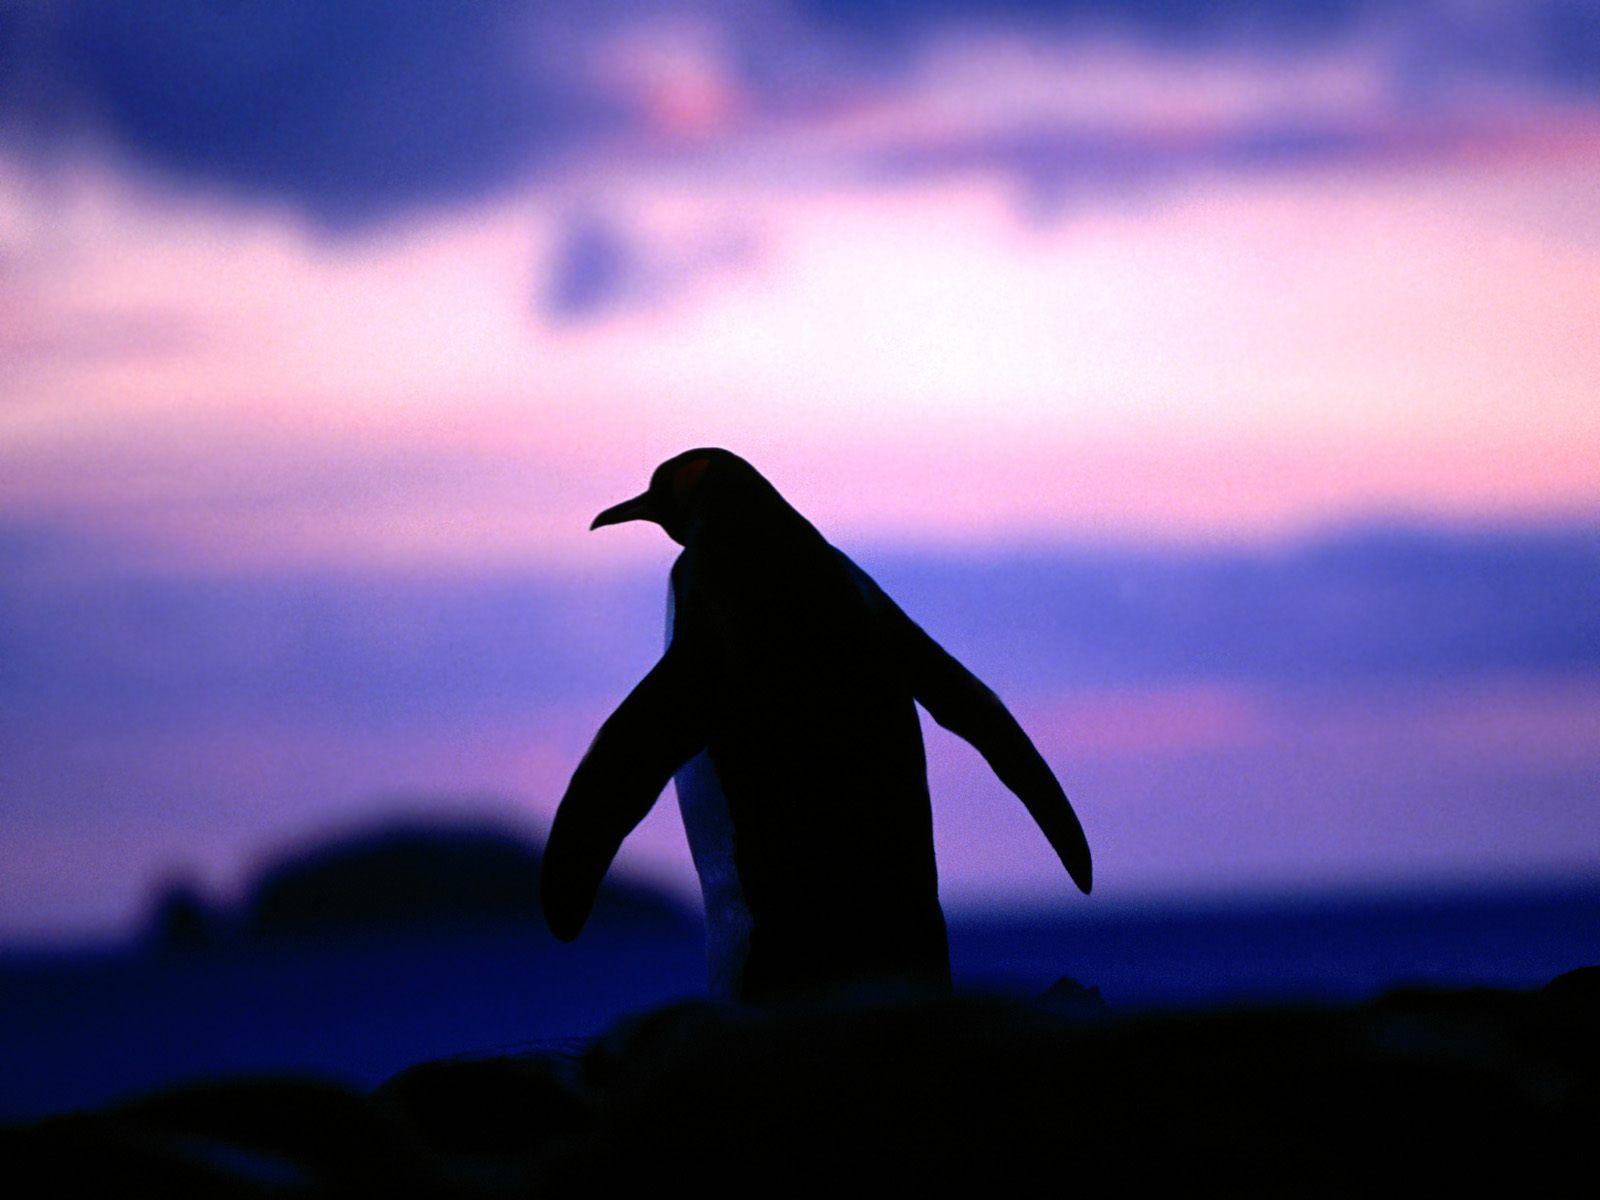 Widescreen resolutions (16:10): 1280x800 1440x900 1680x1050 1920x1200. Normal resolutions: 1024x768 1280x1024. Wallpaper Tags: penguin